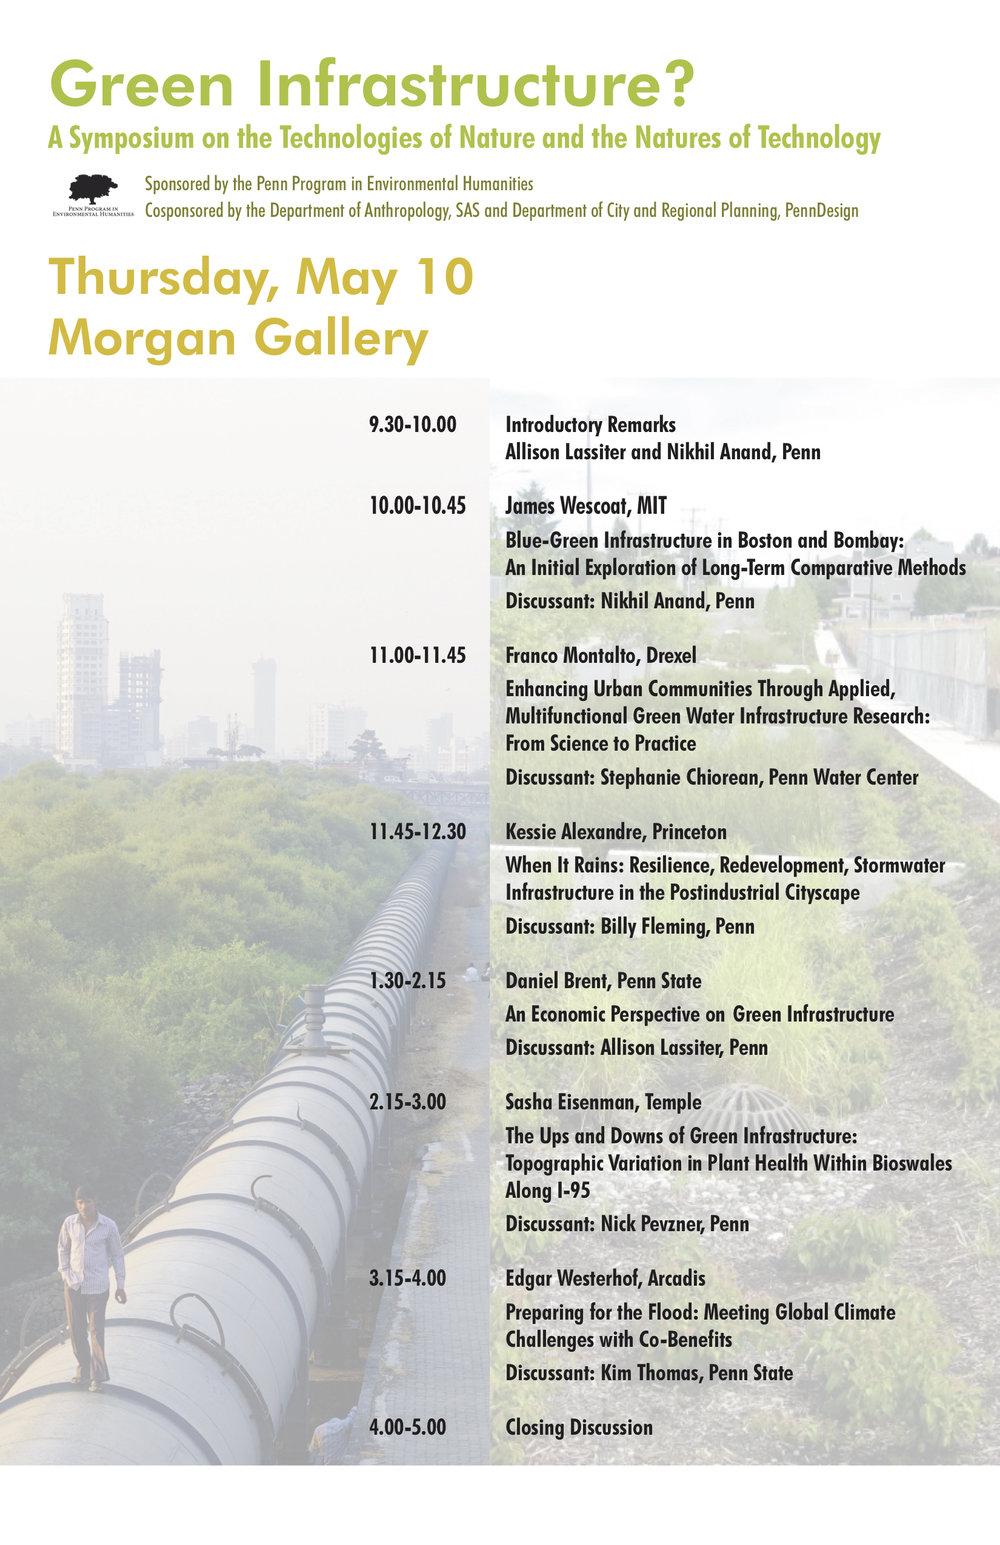 green_infra_symposium_poster3.jpg